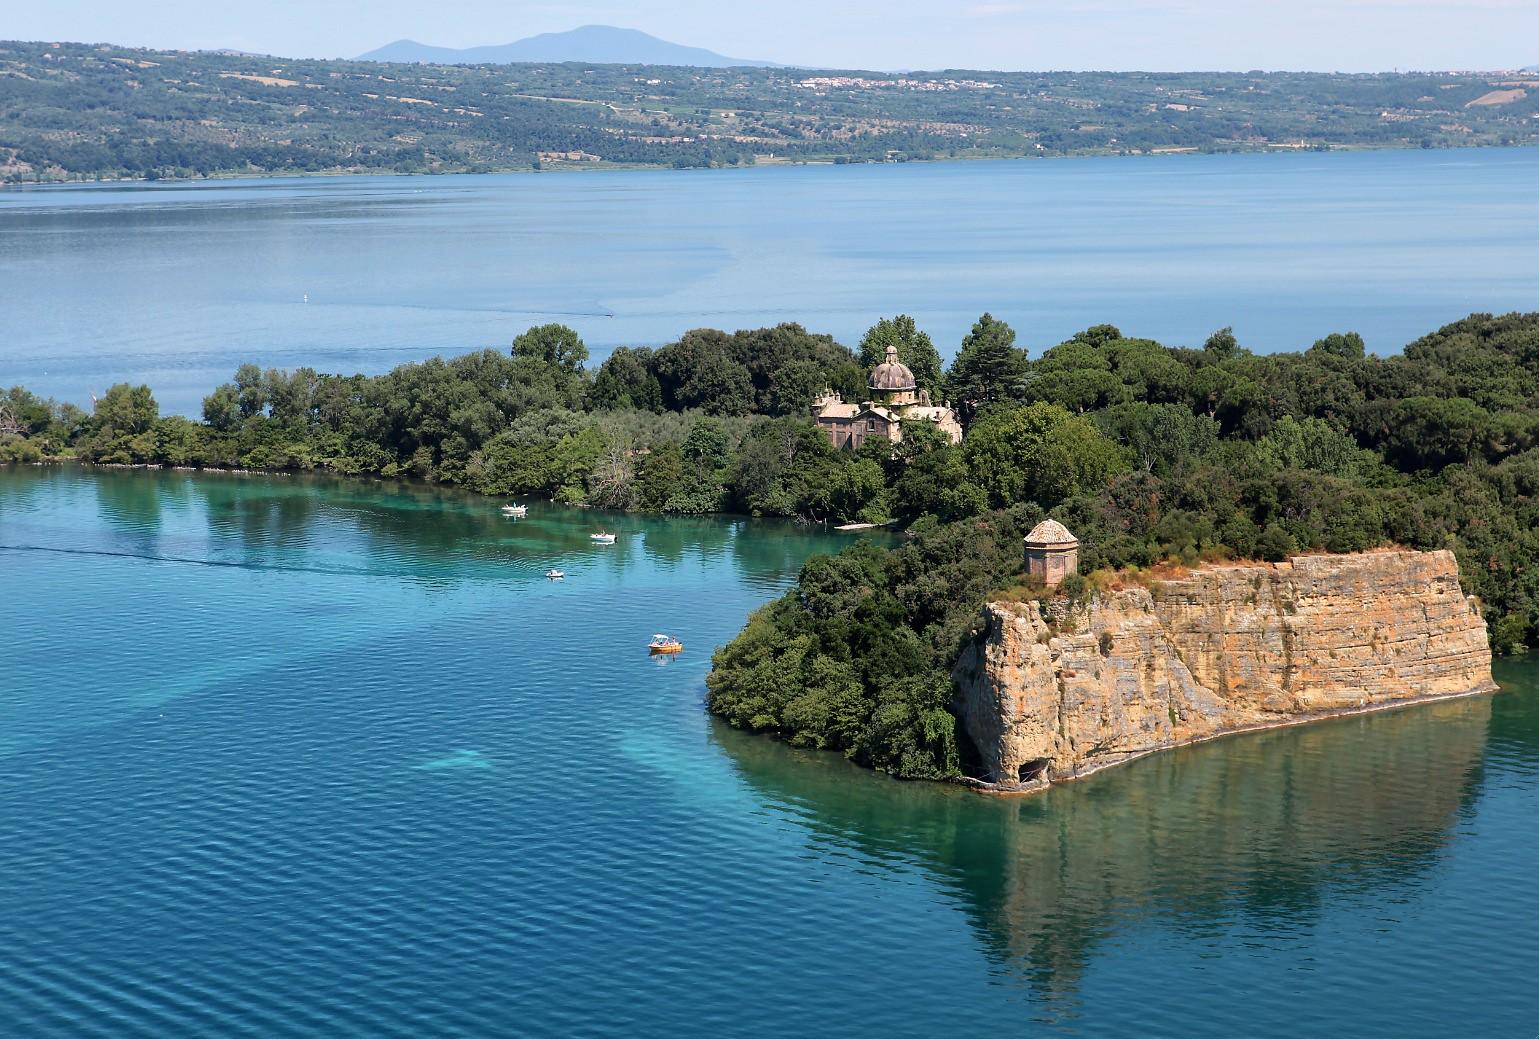 Isola Bisentina